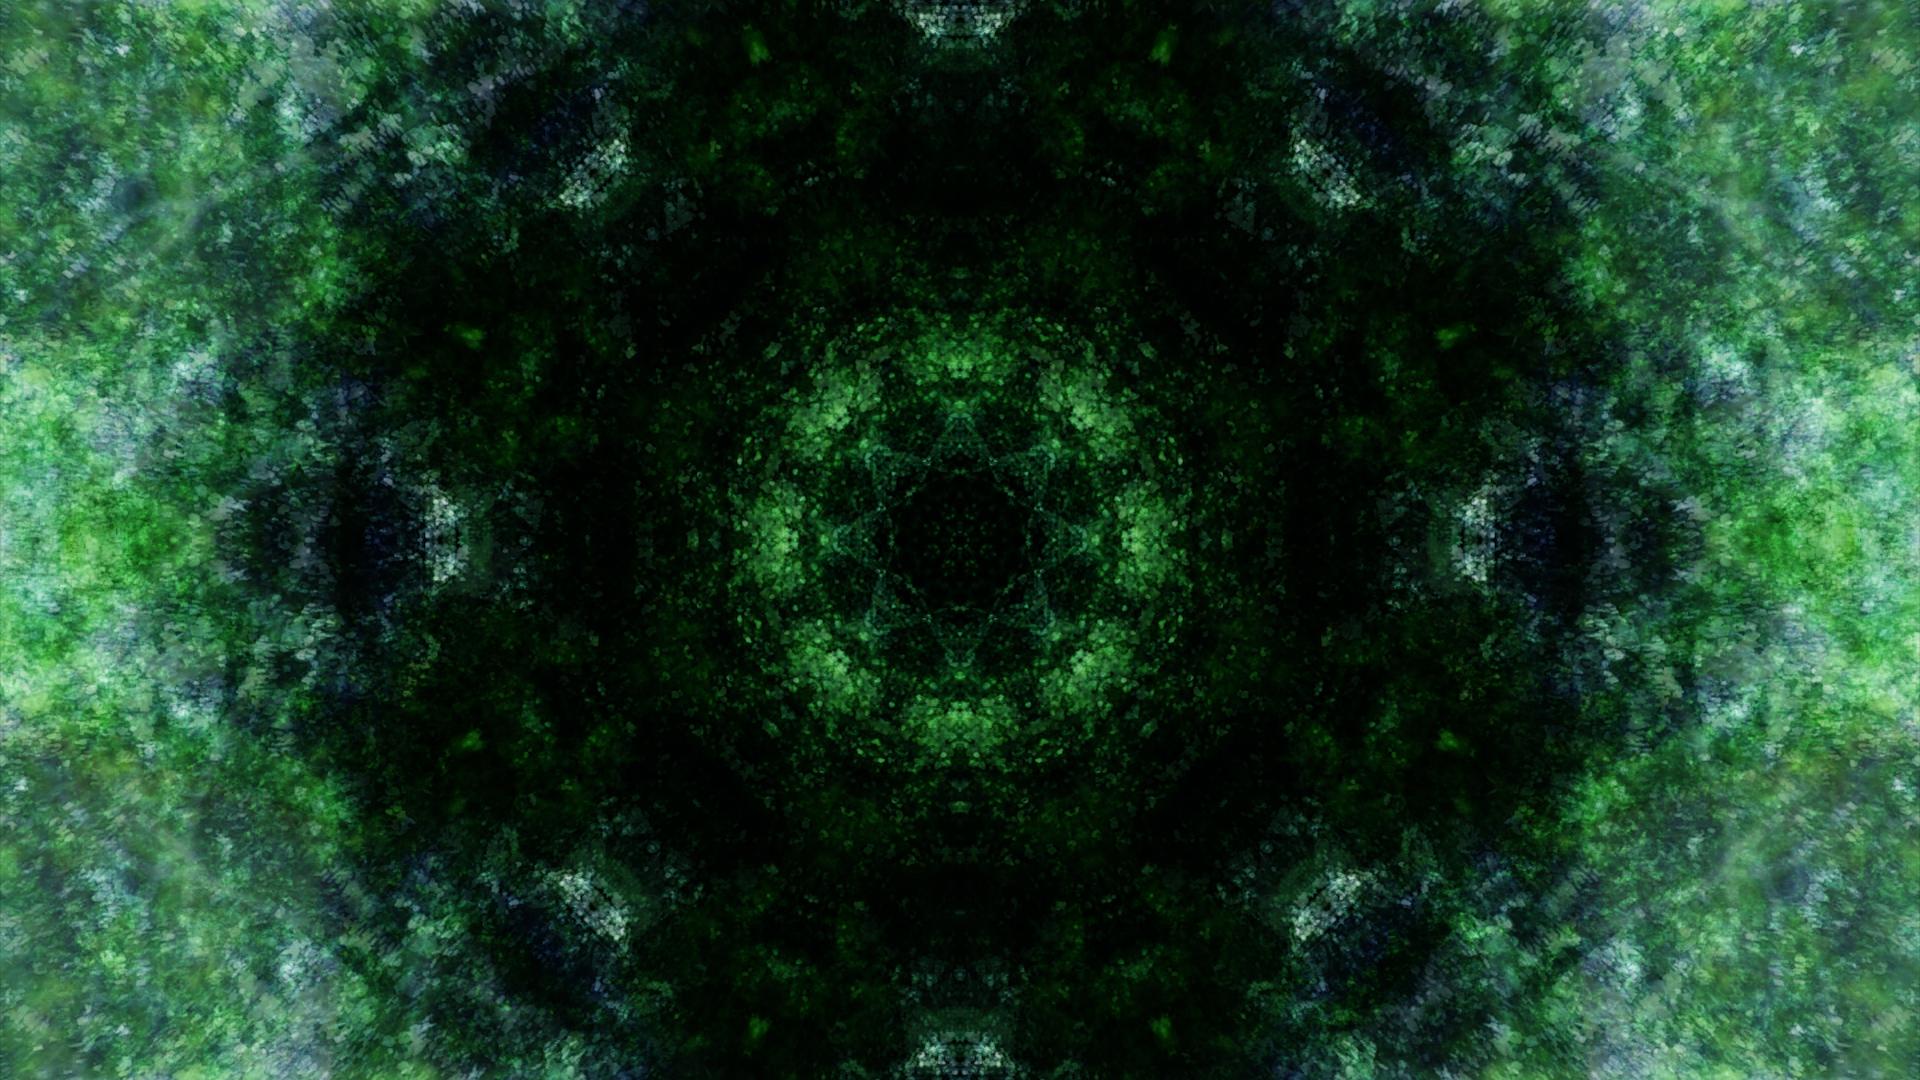 Emitting Velocity - Mohican Forest by Matt Swift Still 11